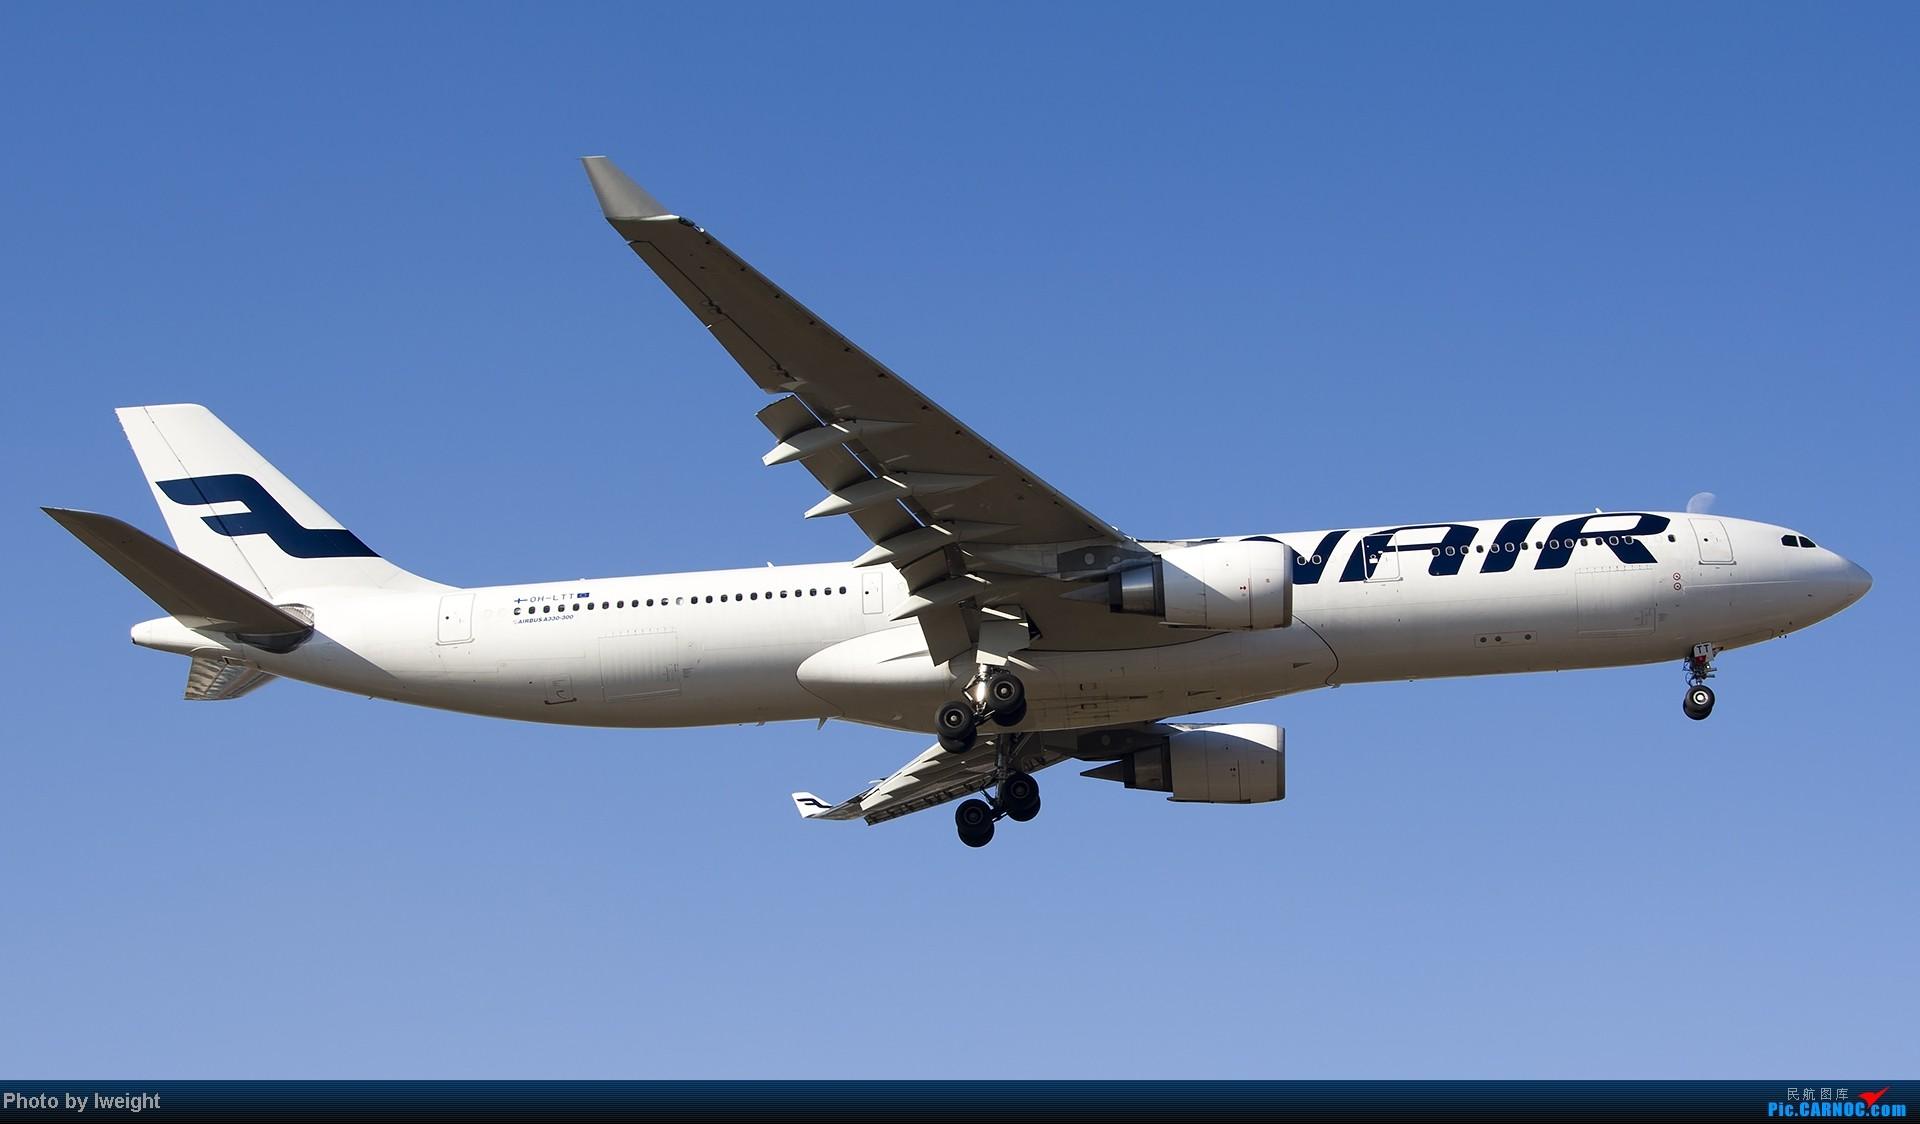 Re:[原创]抓住APEC蓝的尾巴,再拍上一组 AIRBUS A330-300 OH-LTT 中国北京首都机场